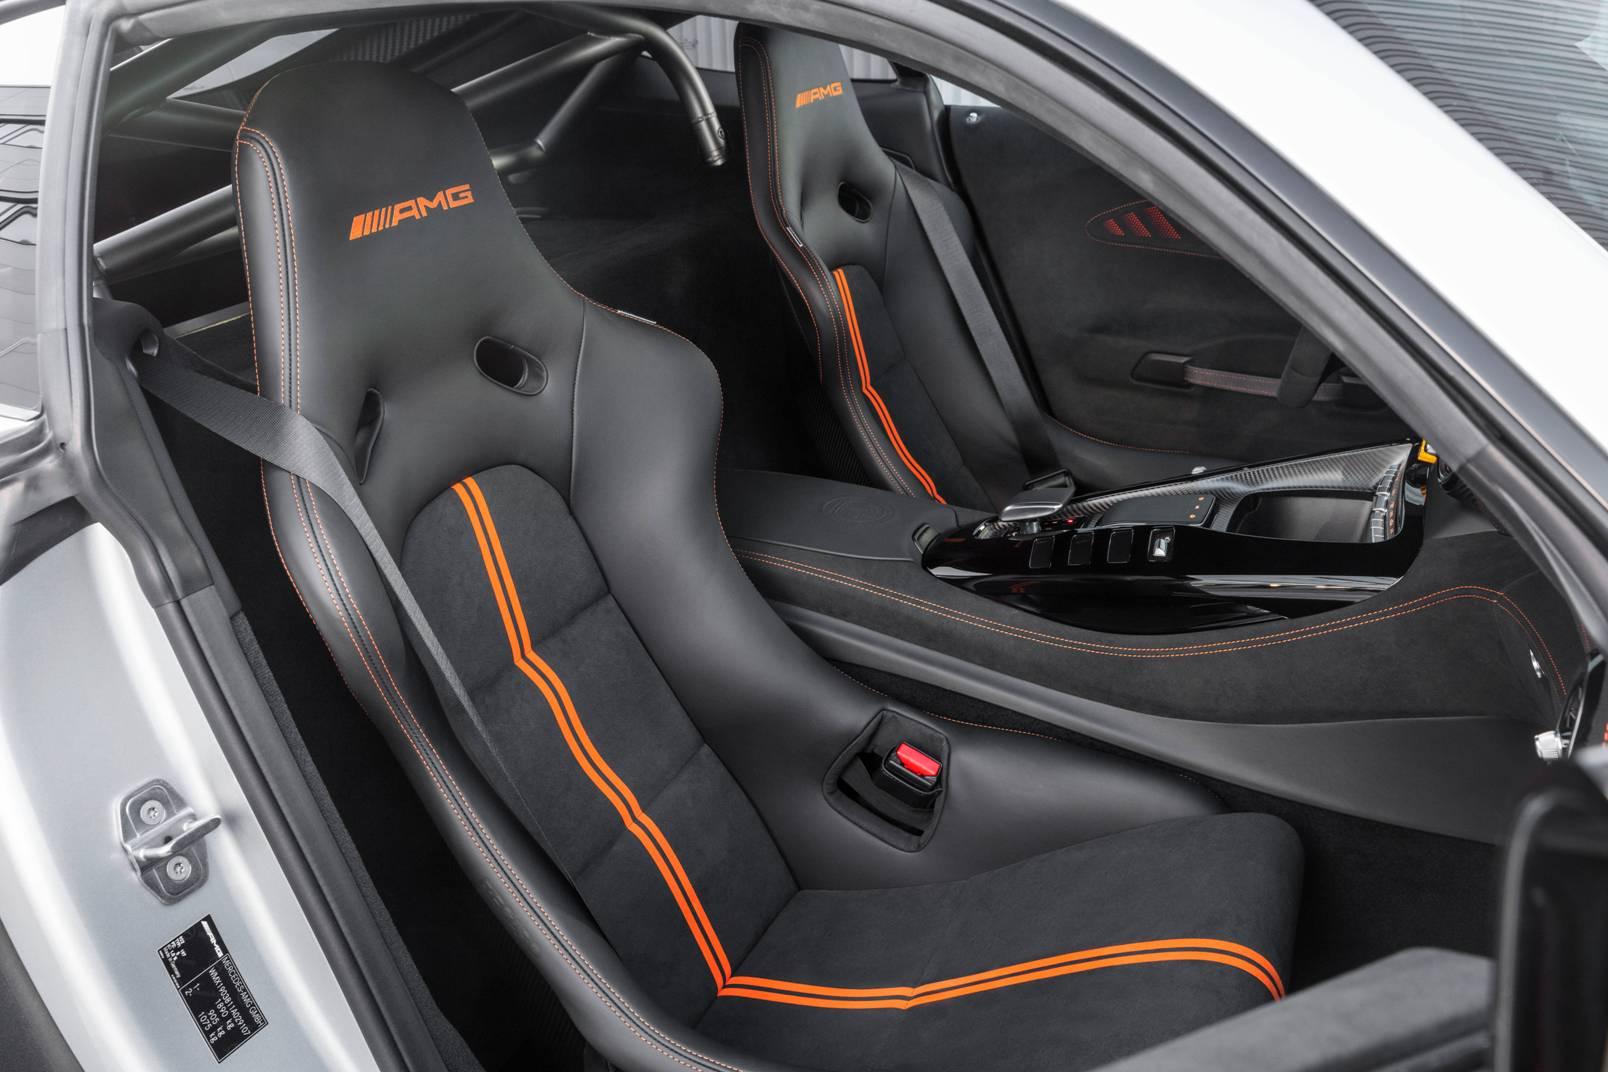 Mercedes Amg Gt Black Series (4)